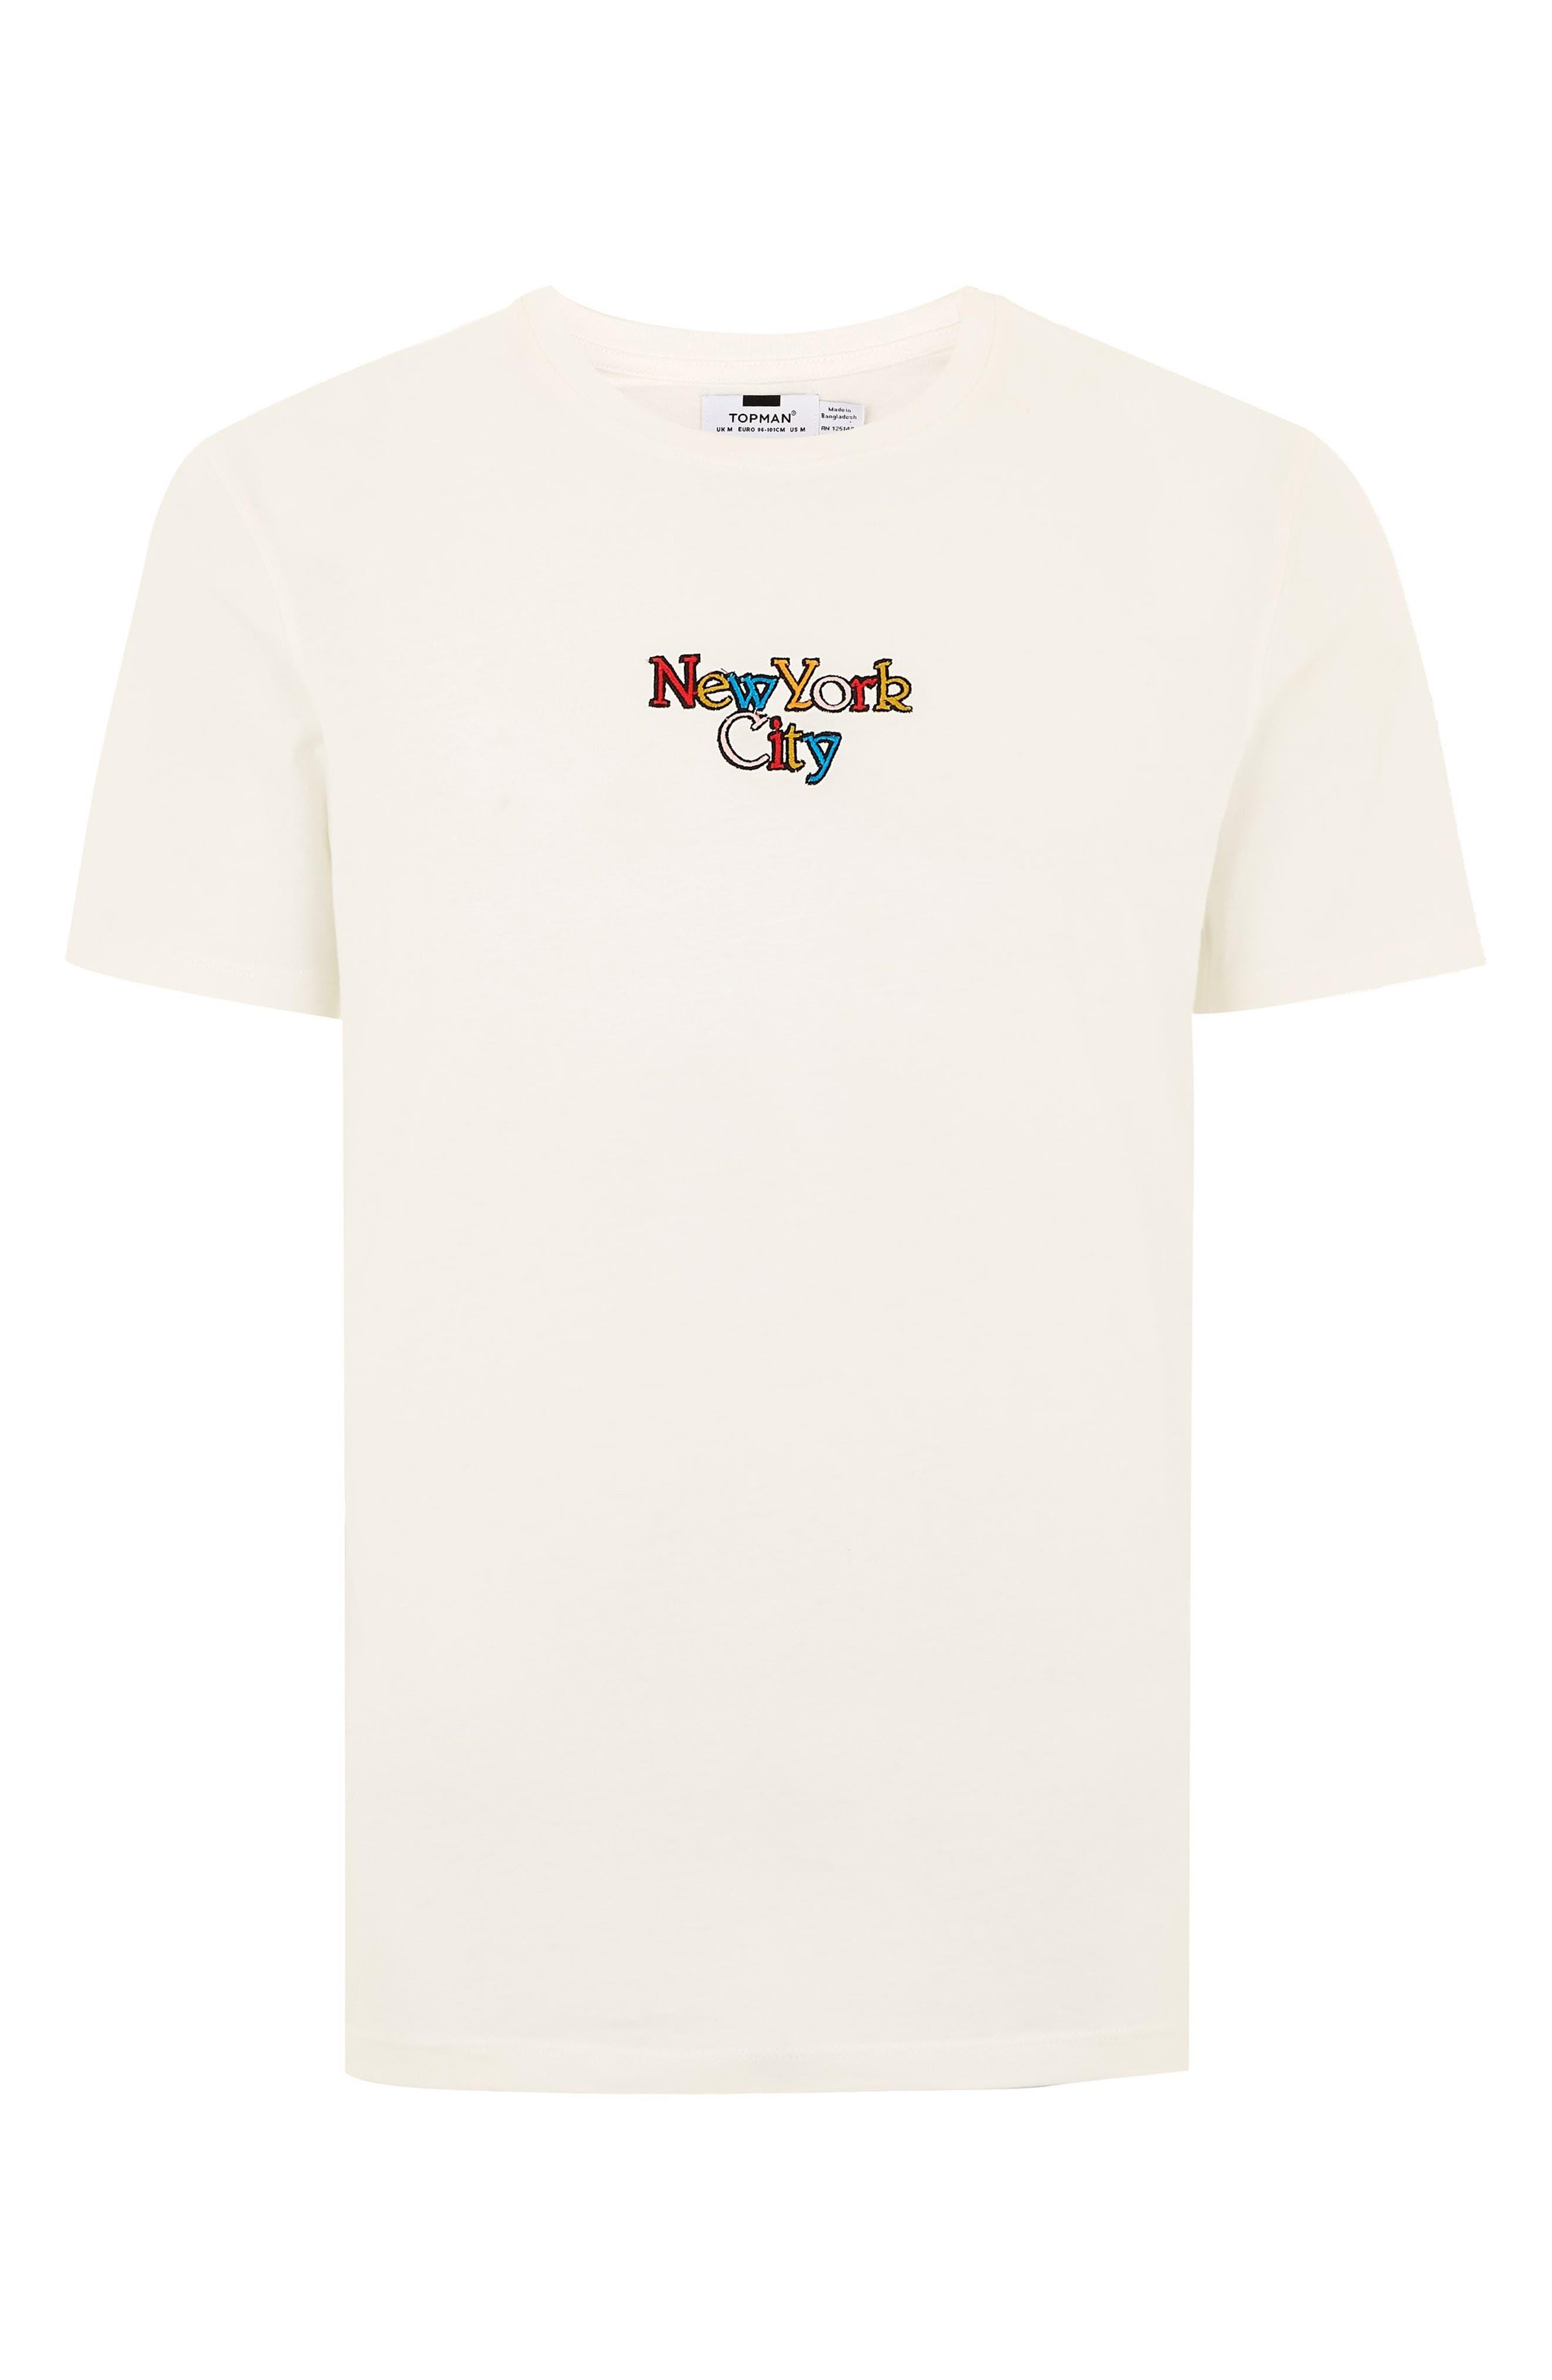 New York City Graphic T-Shirt,                             Alternate thumbnail 4, color,                             CREAM